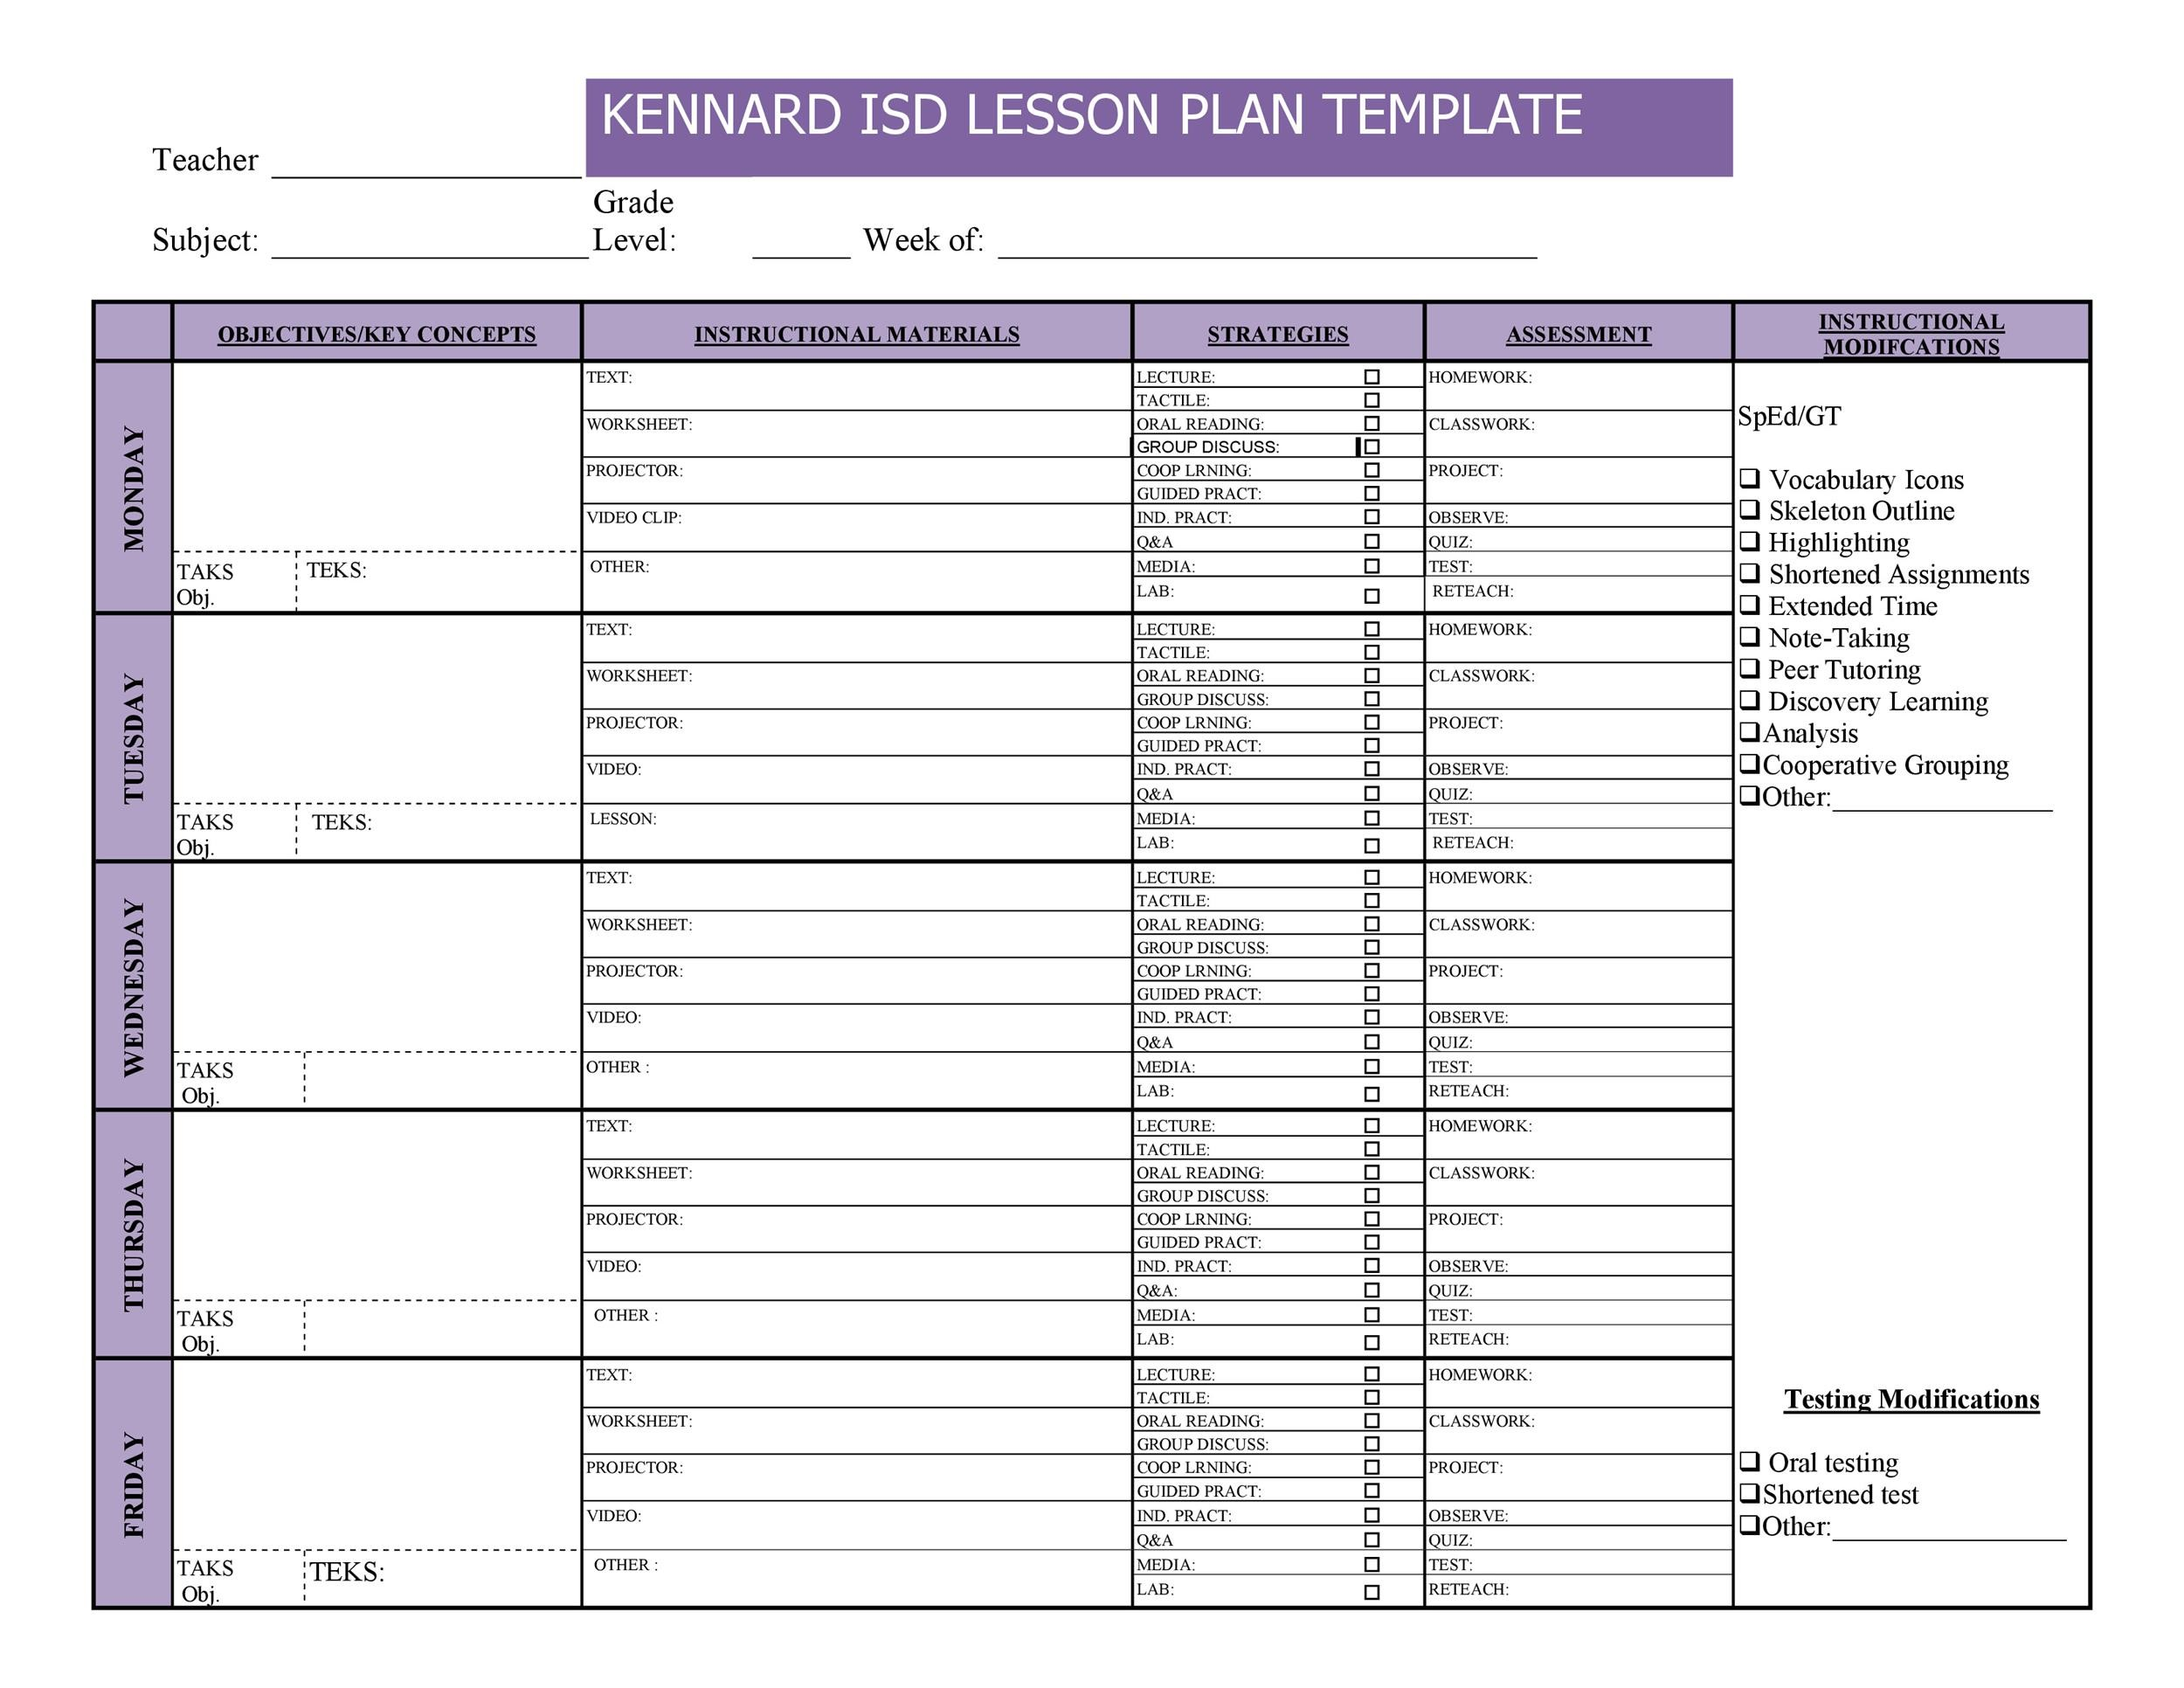 44 FREE Lesson Plan Templates Common Core, Preschool, Weekly - free weekly lesson plan templates